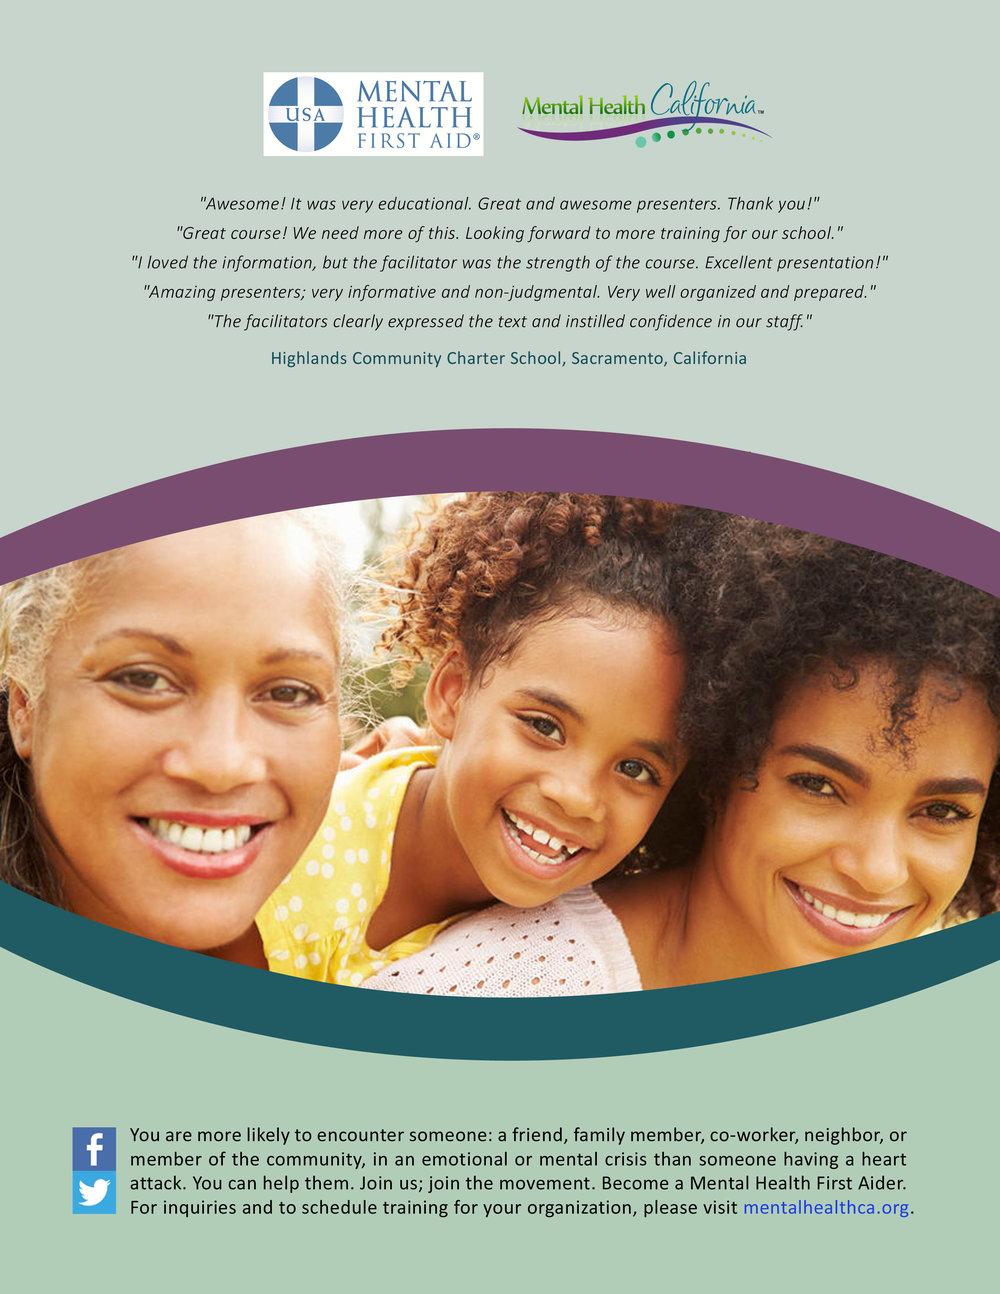 MHFA Flyer.jpg